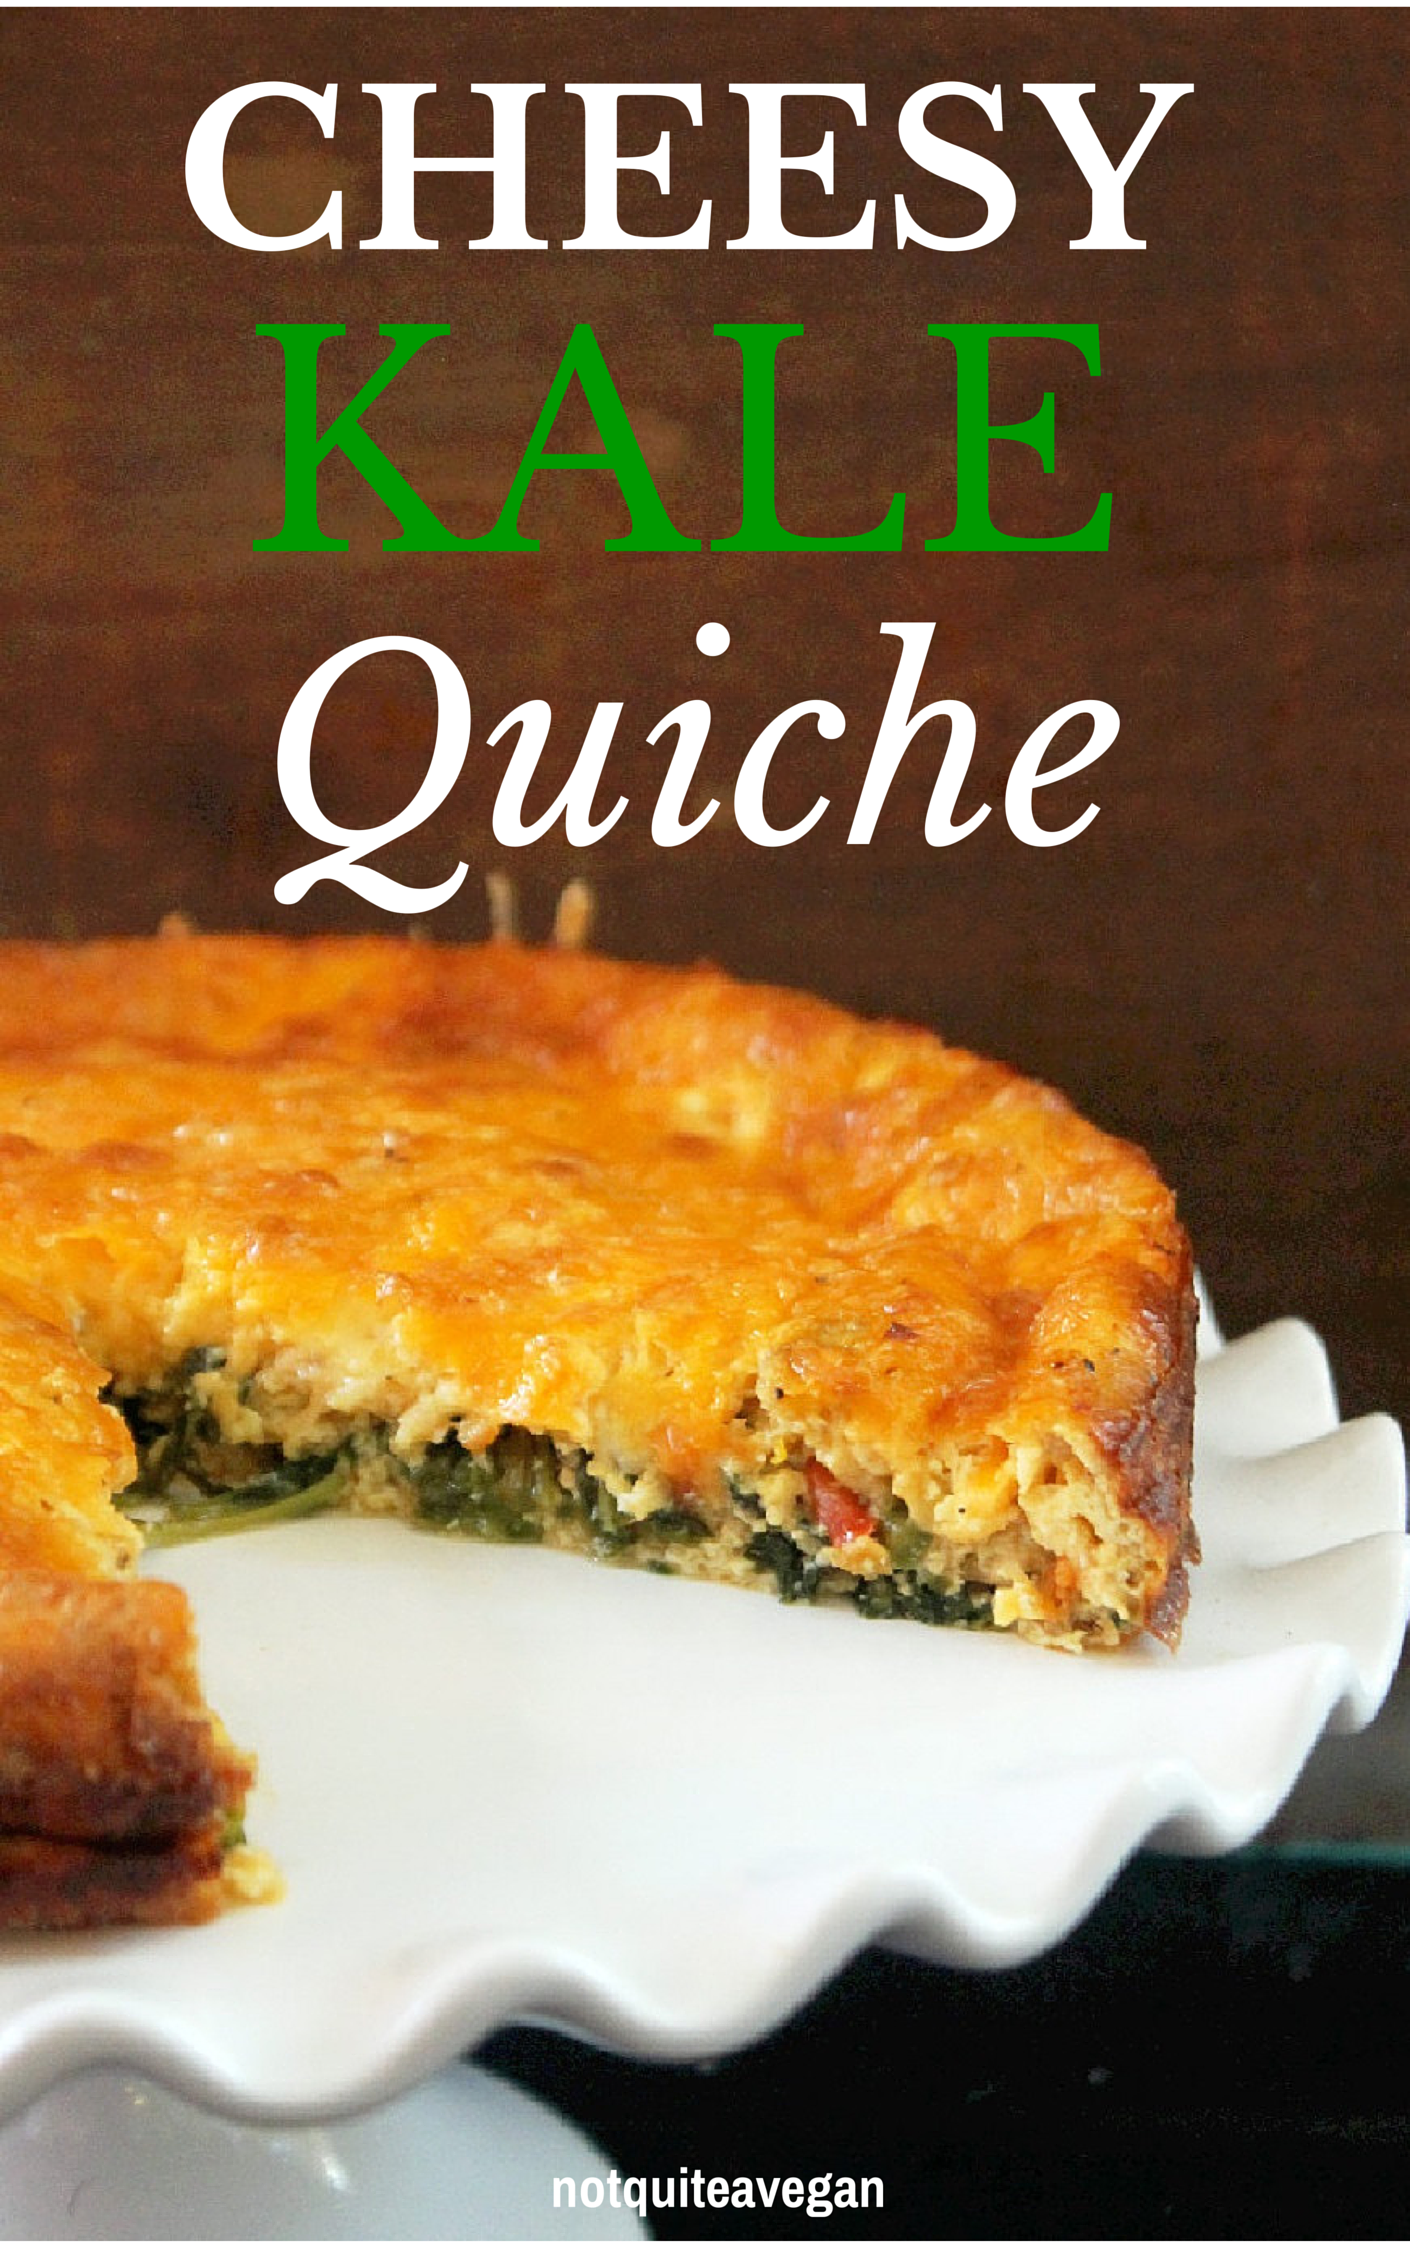 Cheesy Kale Quiche-Not Quite a Vegan